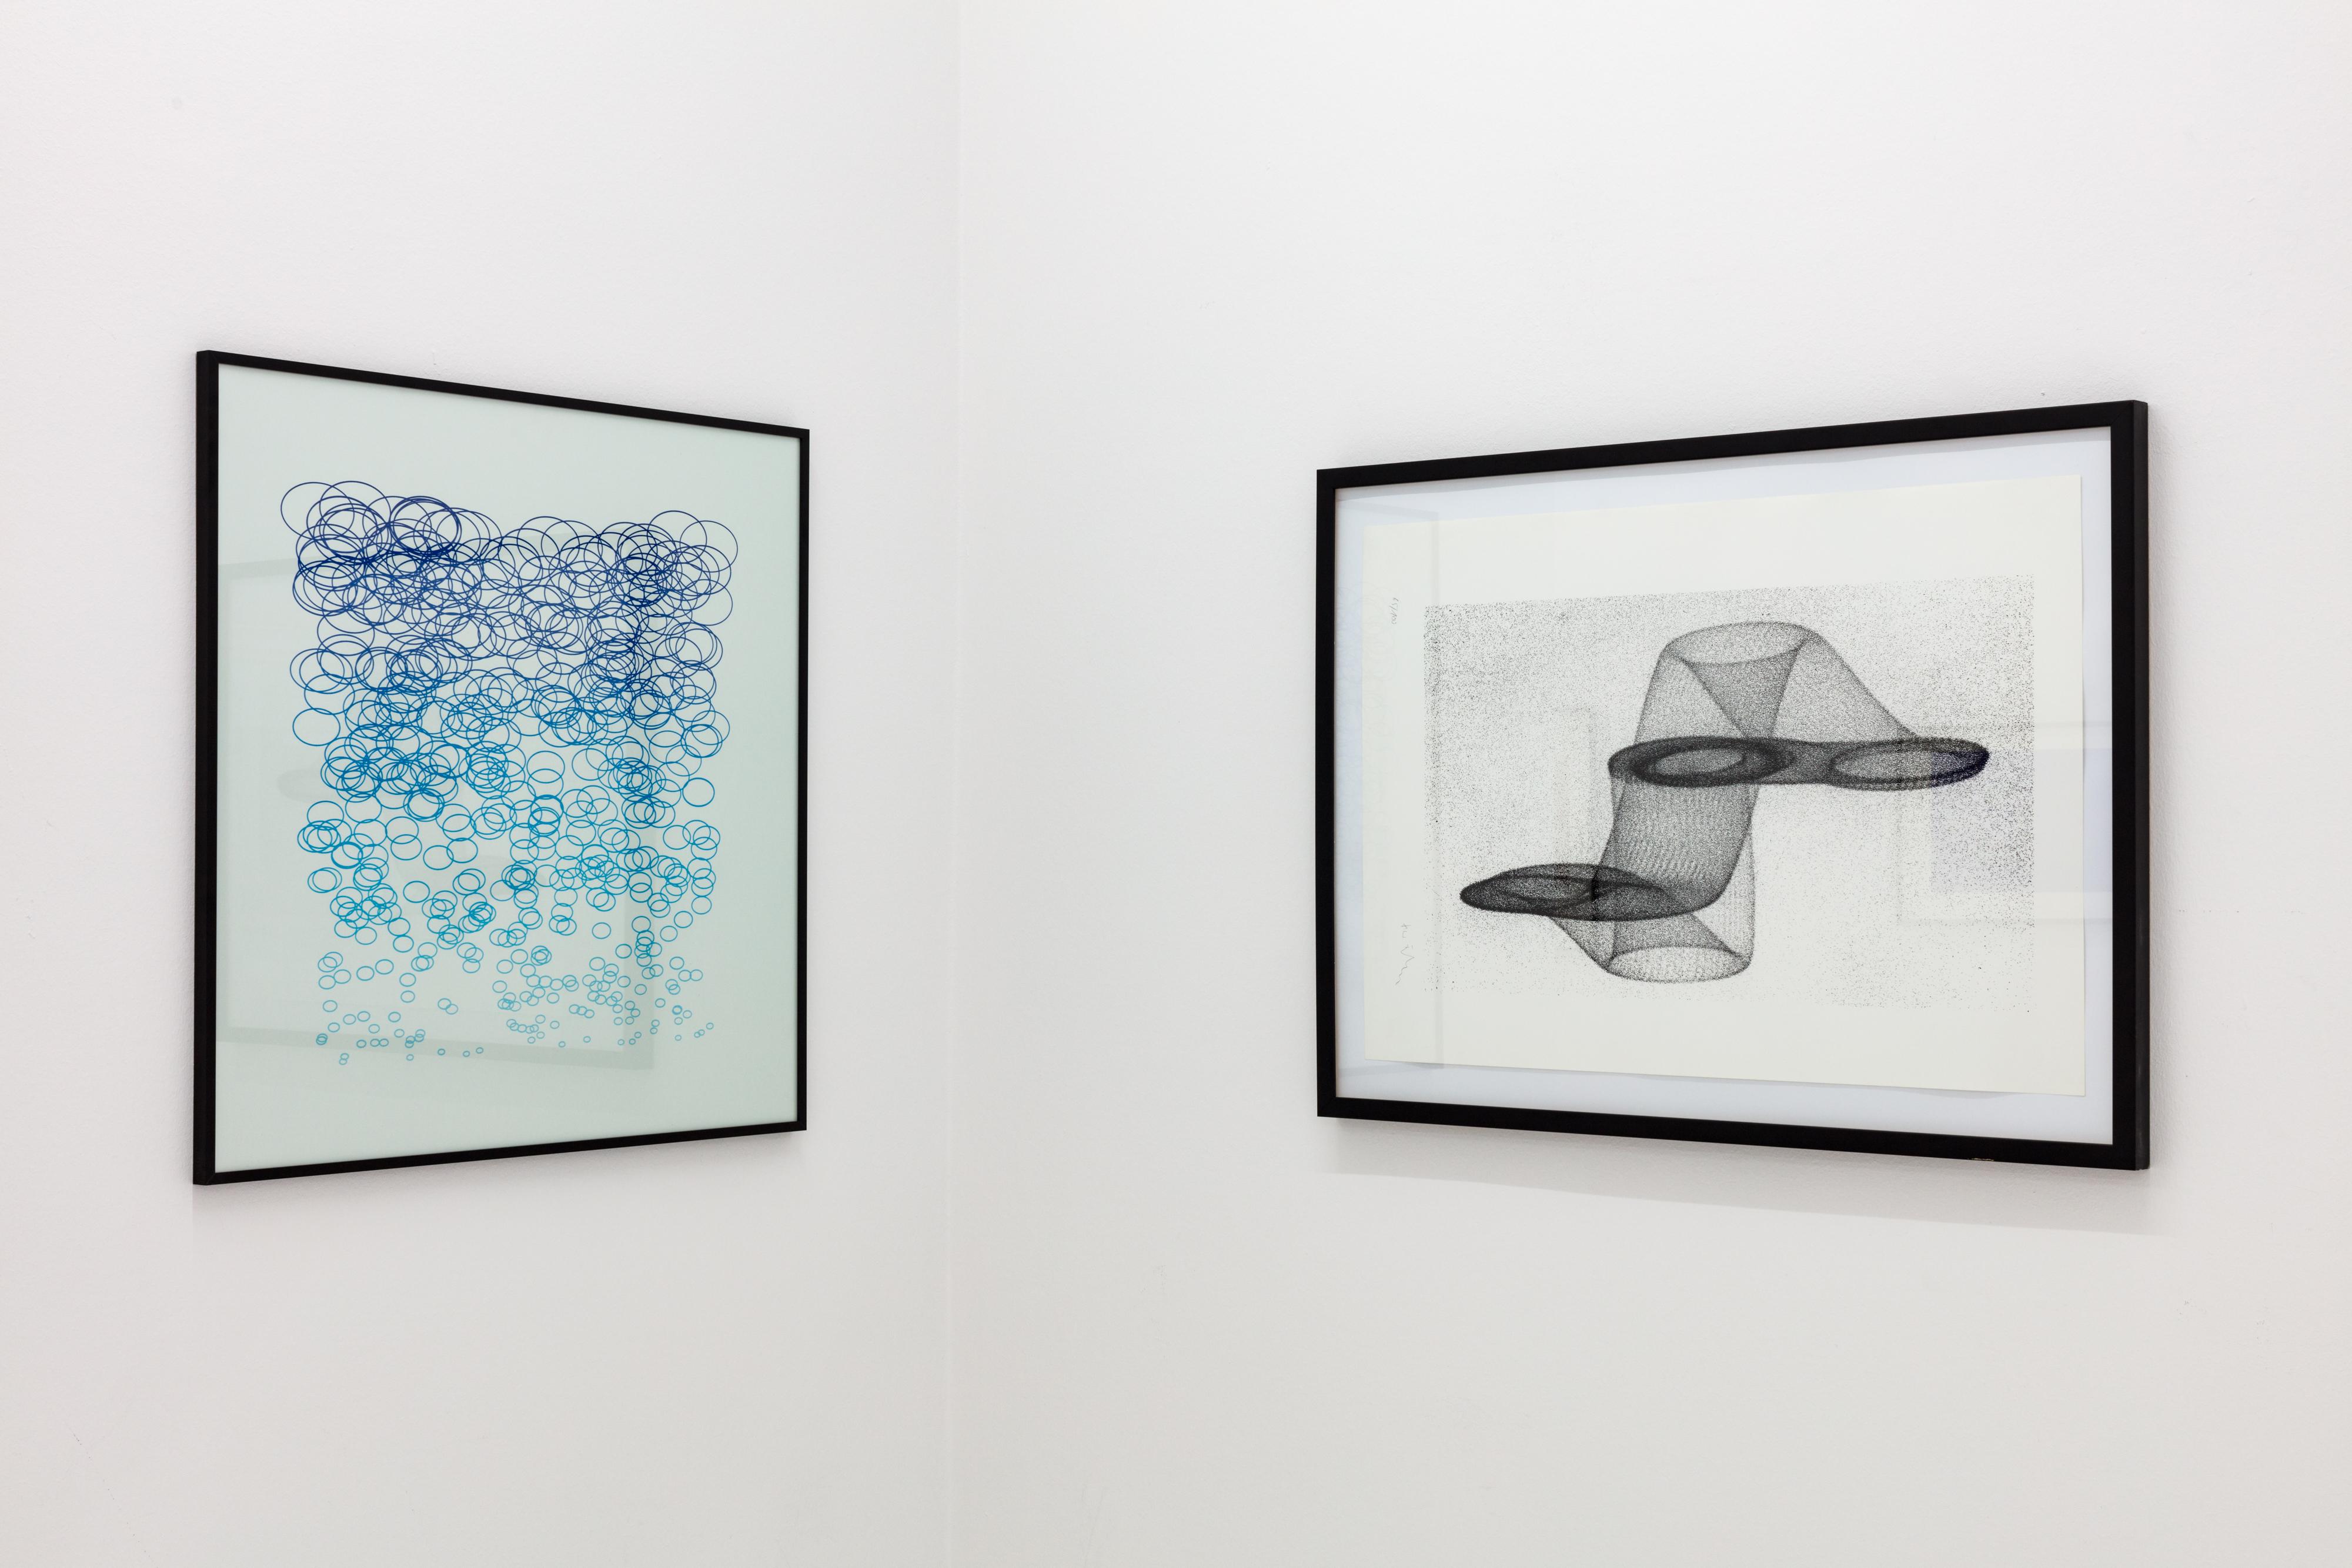 Computer-Grafik 1984, Ausstellungsansicht, 2018